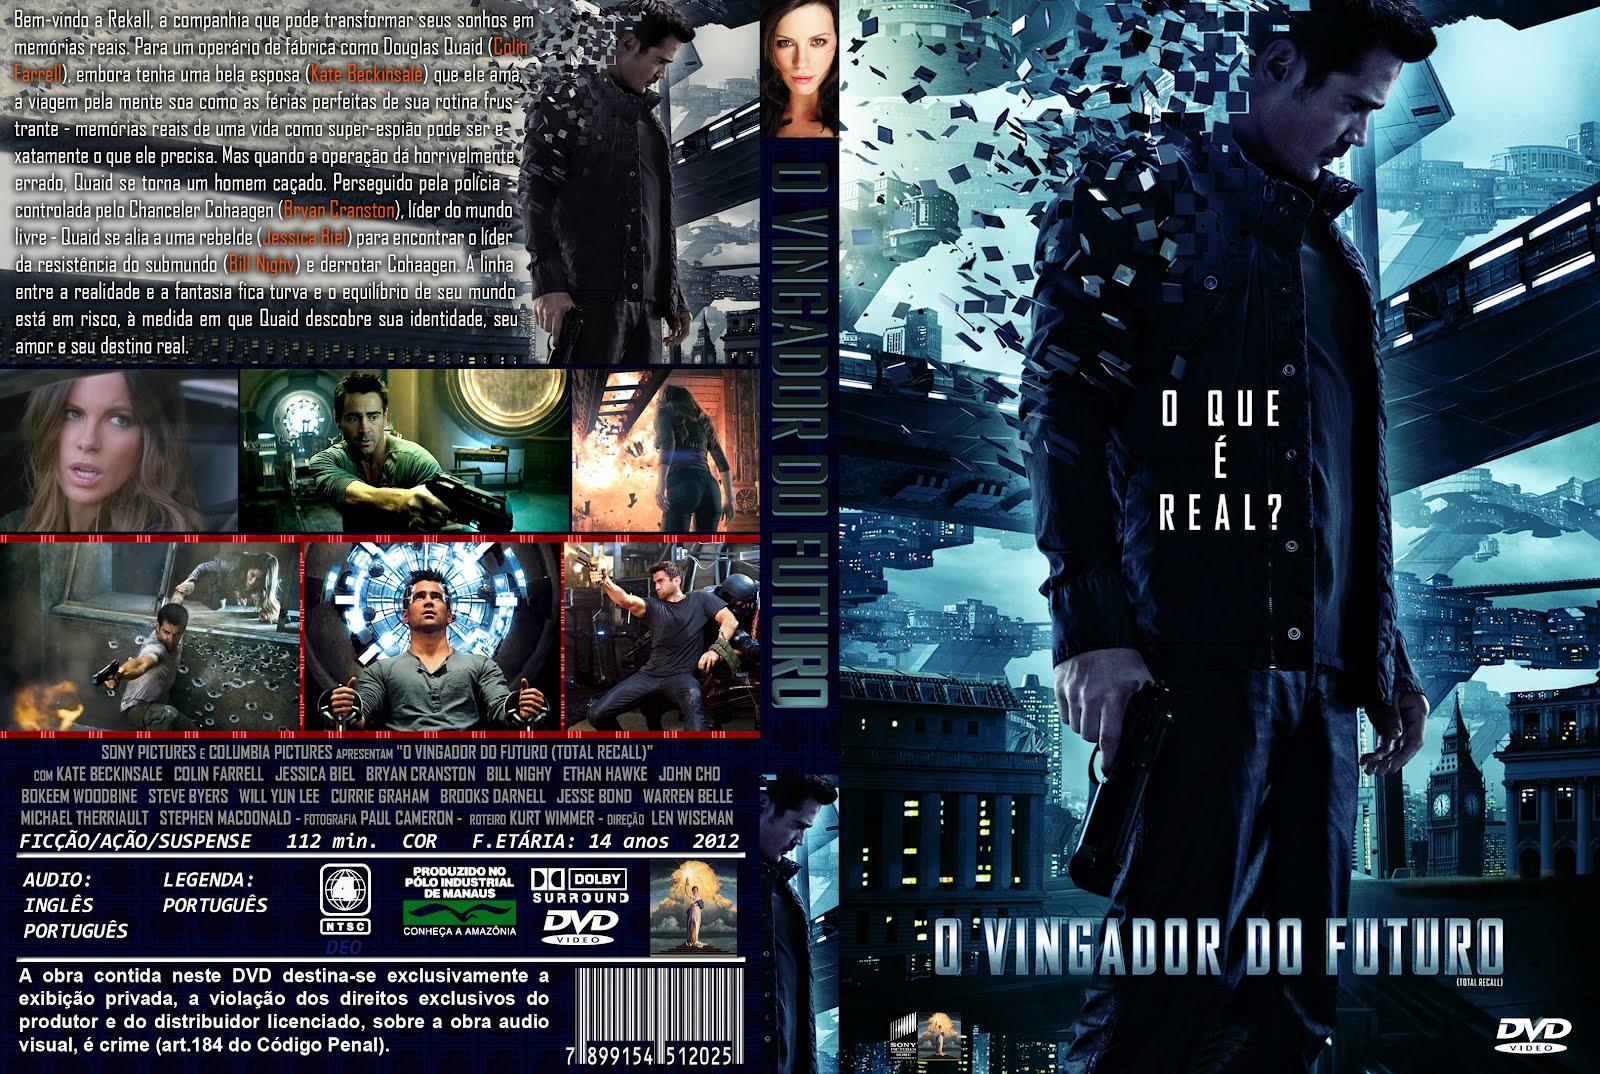 http://1.bp.blogspot.com/-7D3R4hgxrl4/T5__Fp4fNkI/AAAAAAAAGWc/Wp-vEBV7Bu0/s1600/O+Vingador+do+Futuro.jpg